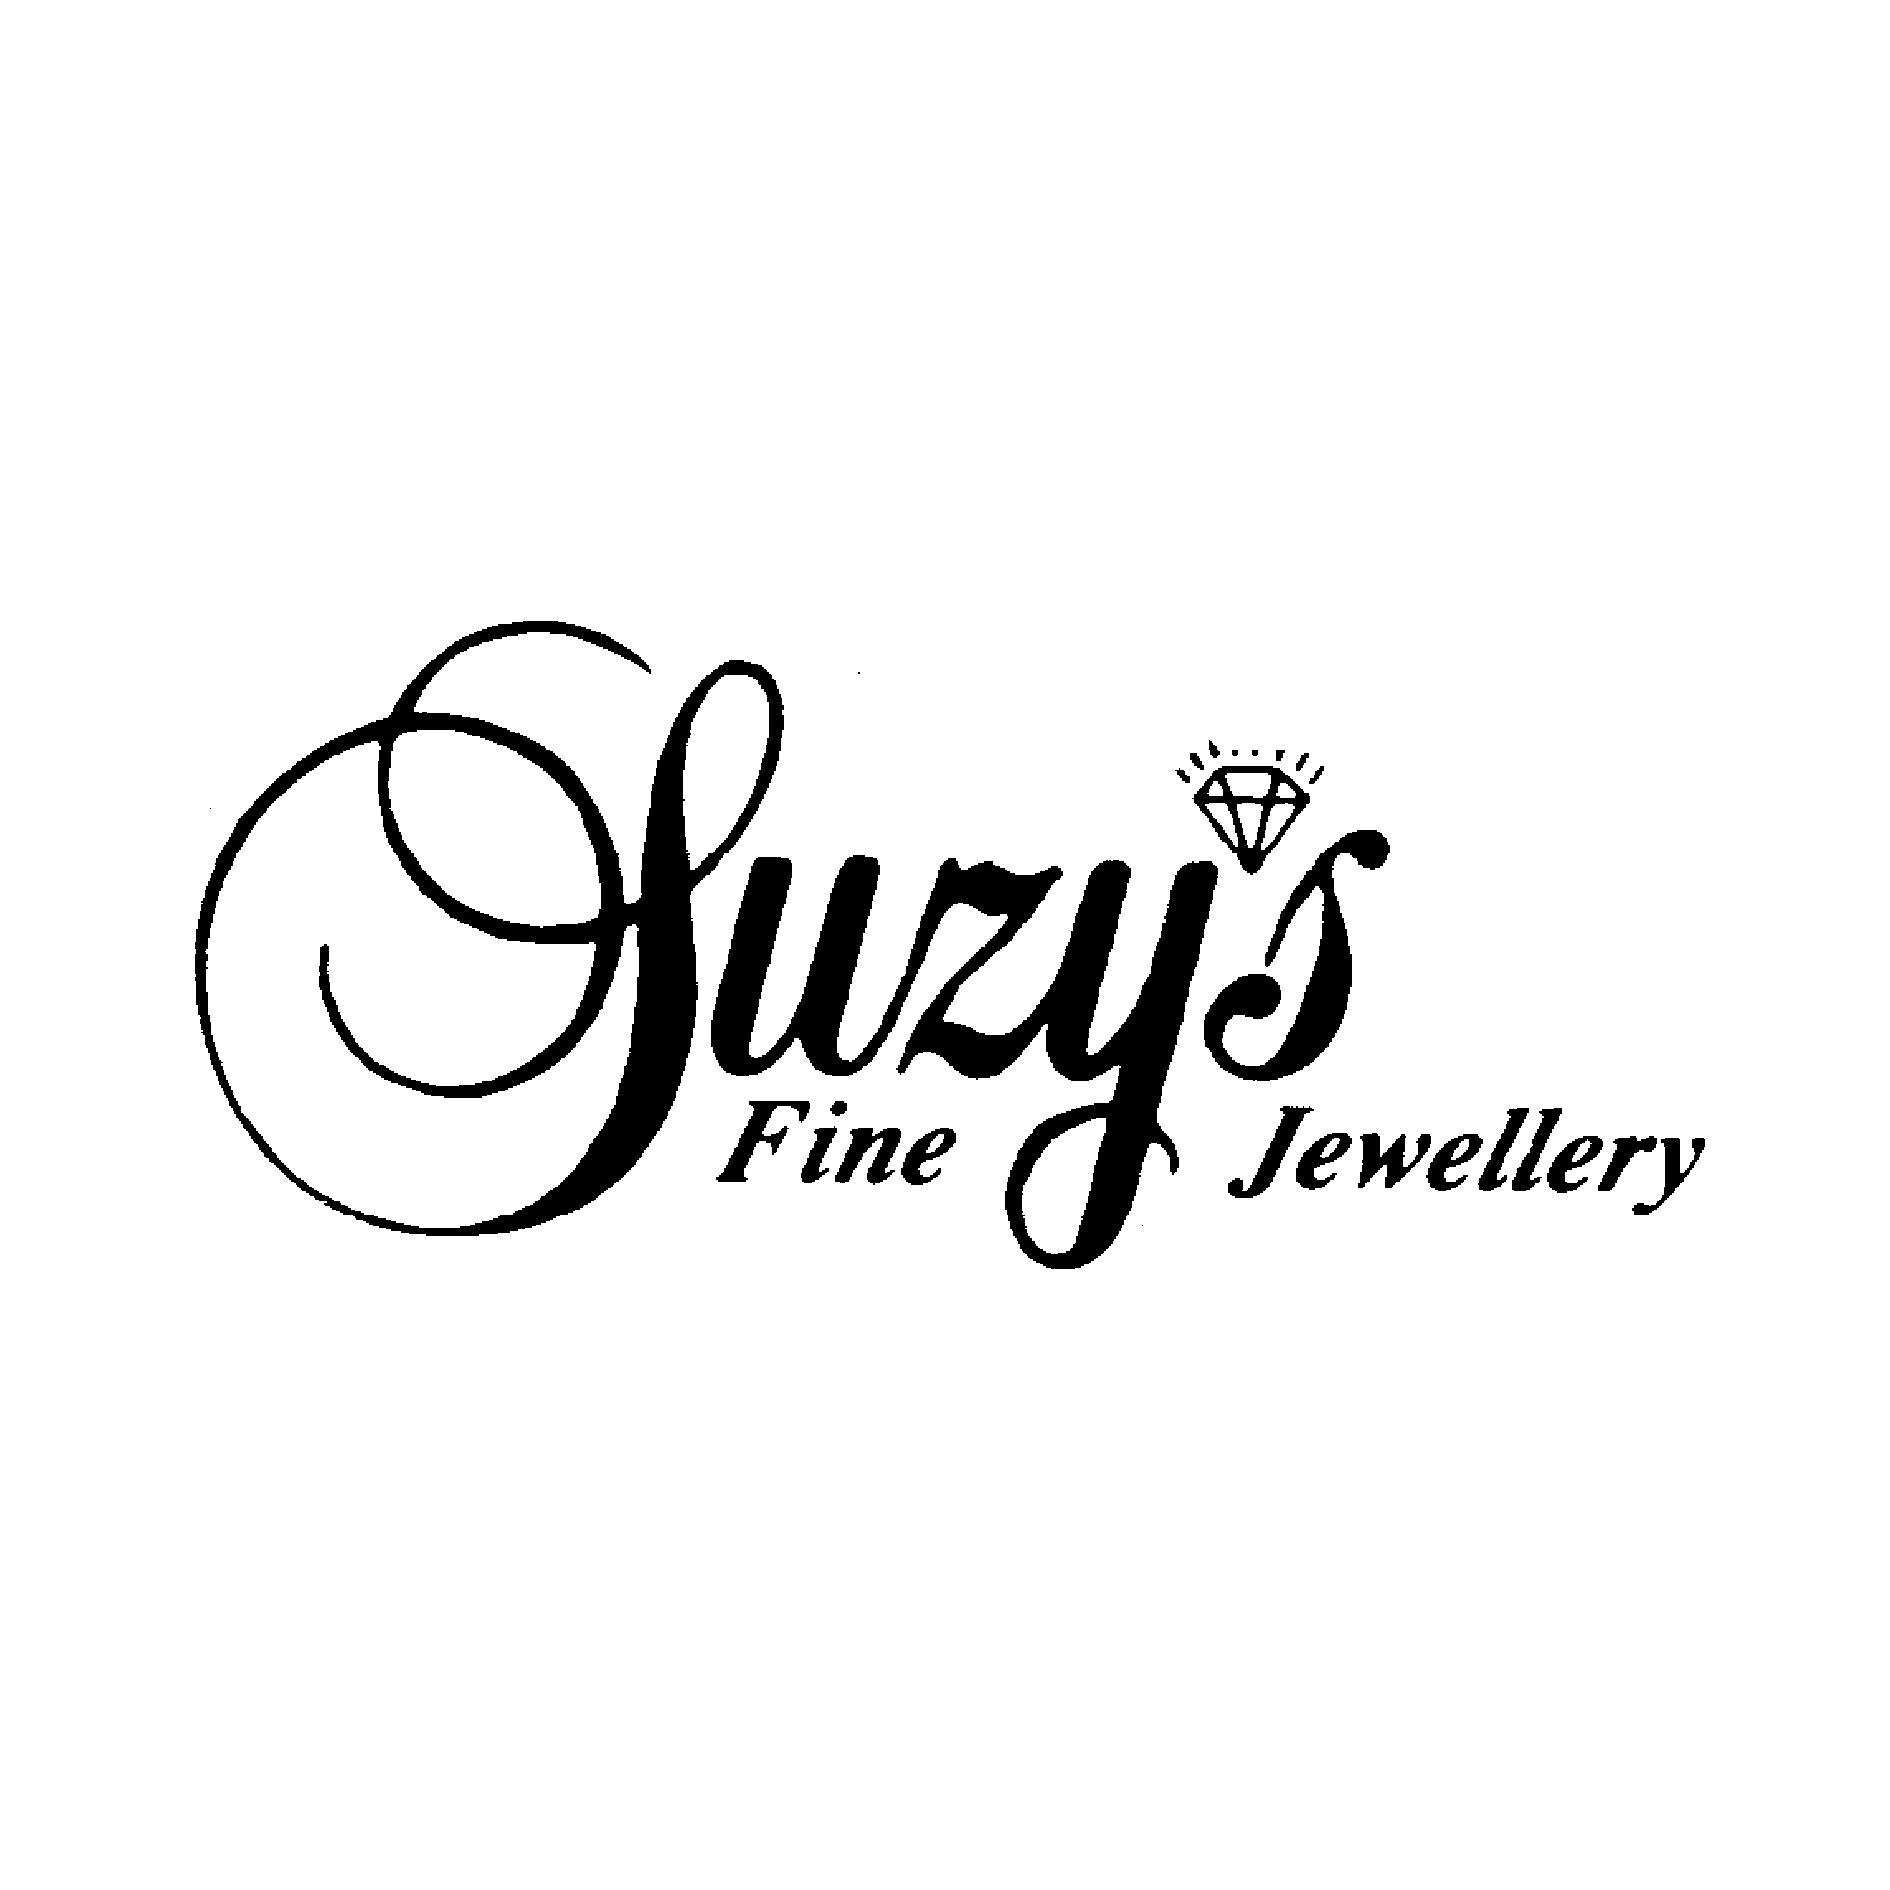 Suzys.jpg